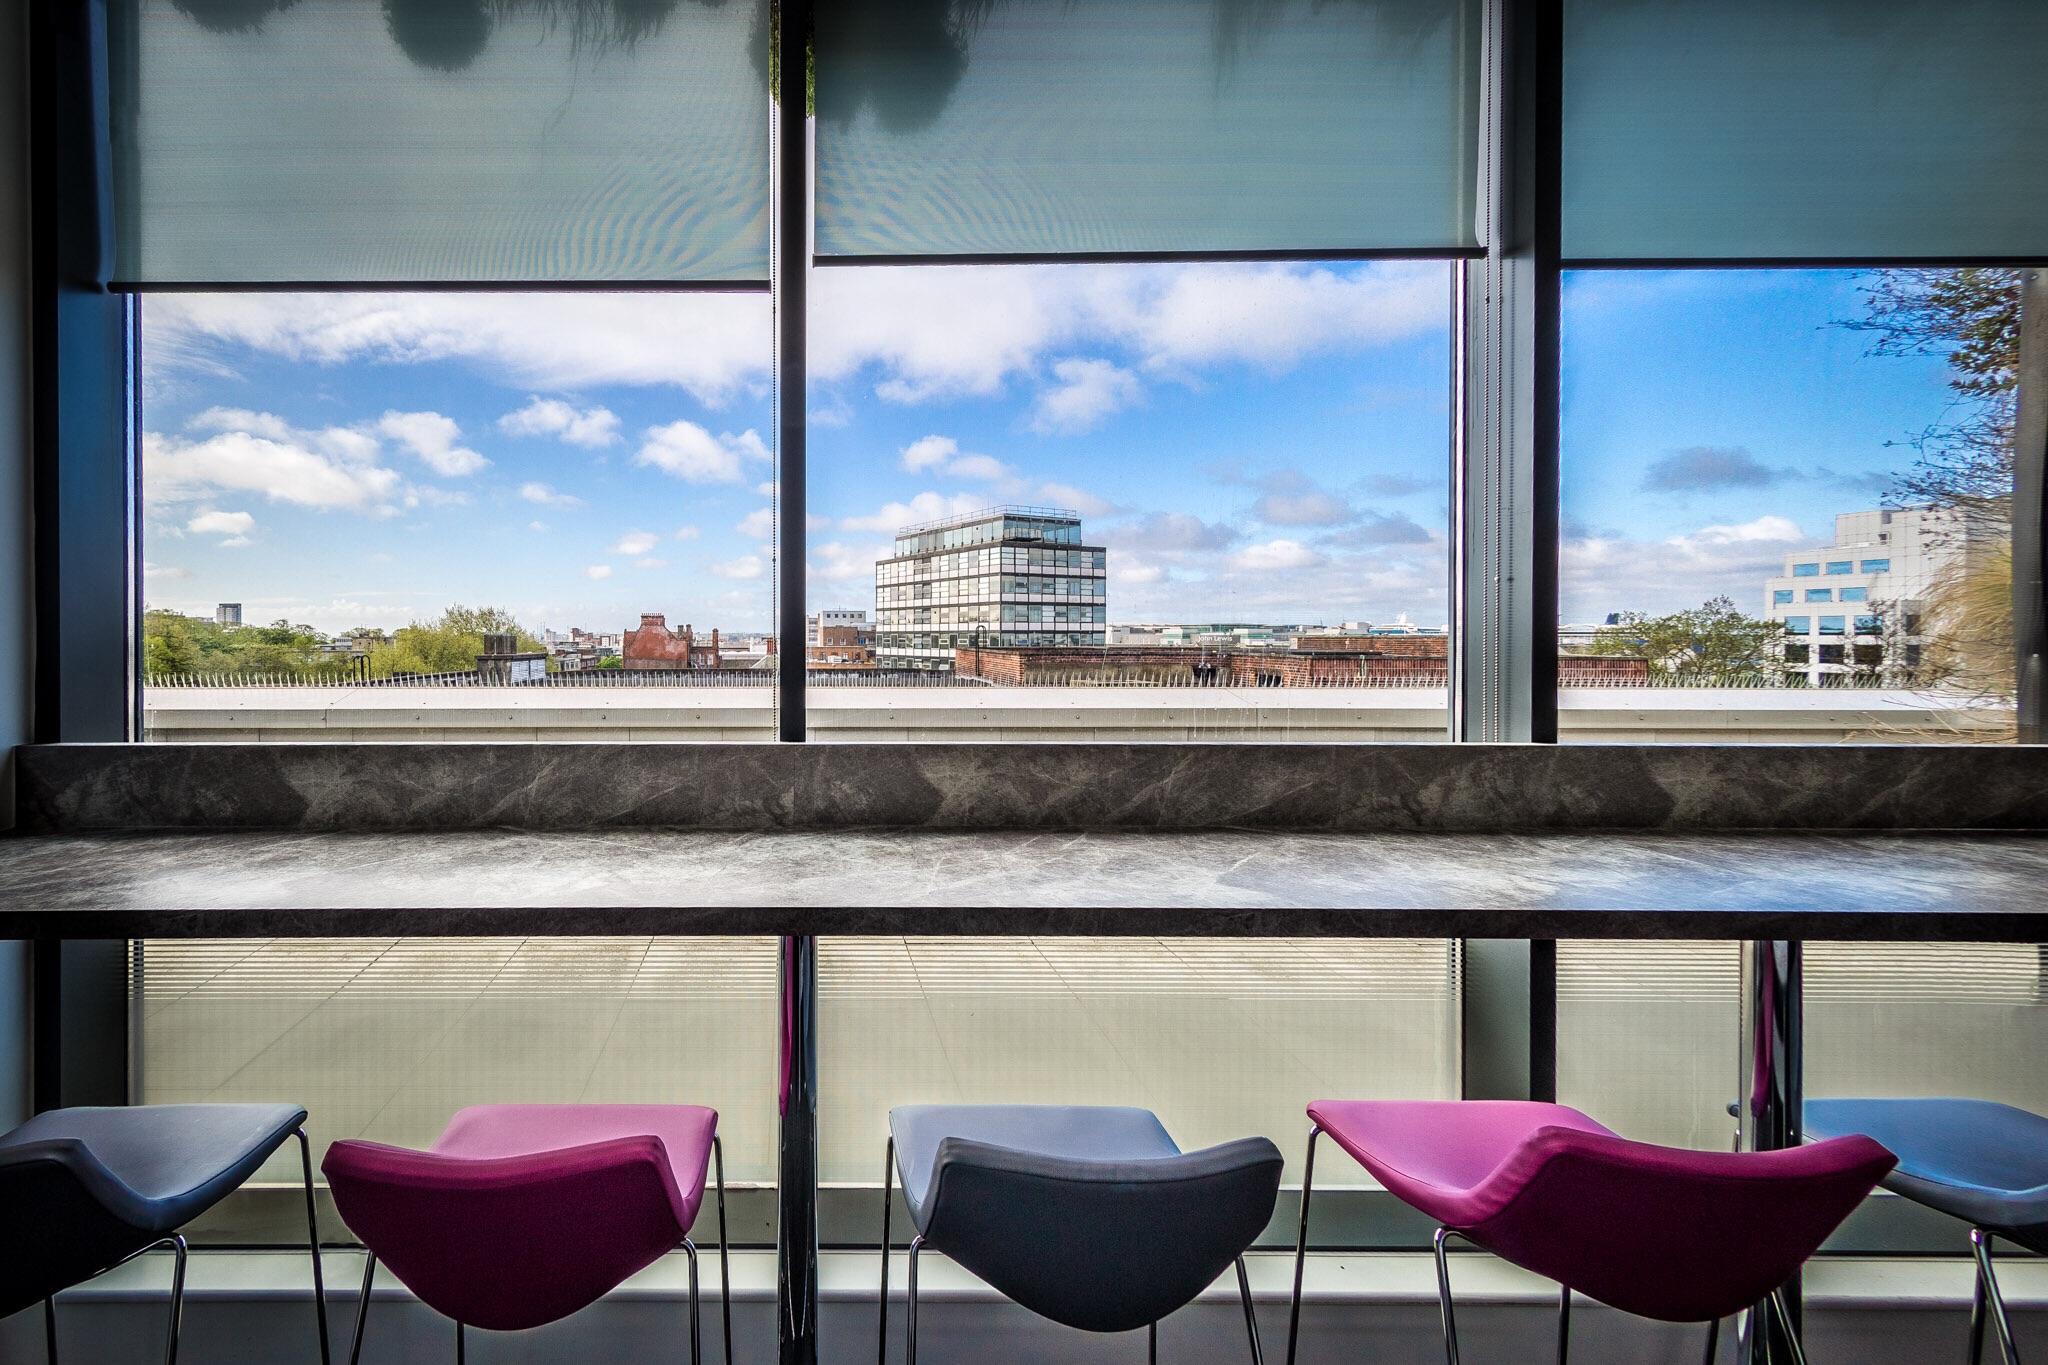 Seats, University of Southampton by Rick McEvoy, interior photographer